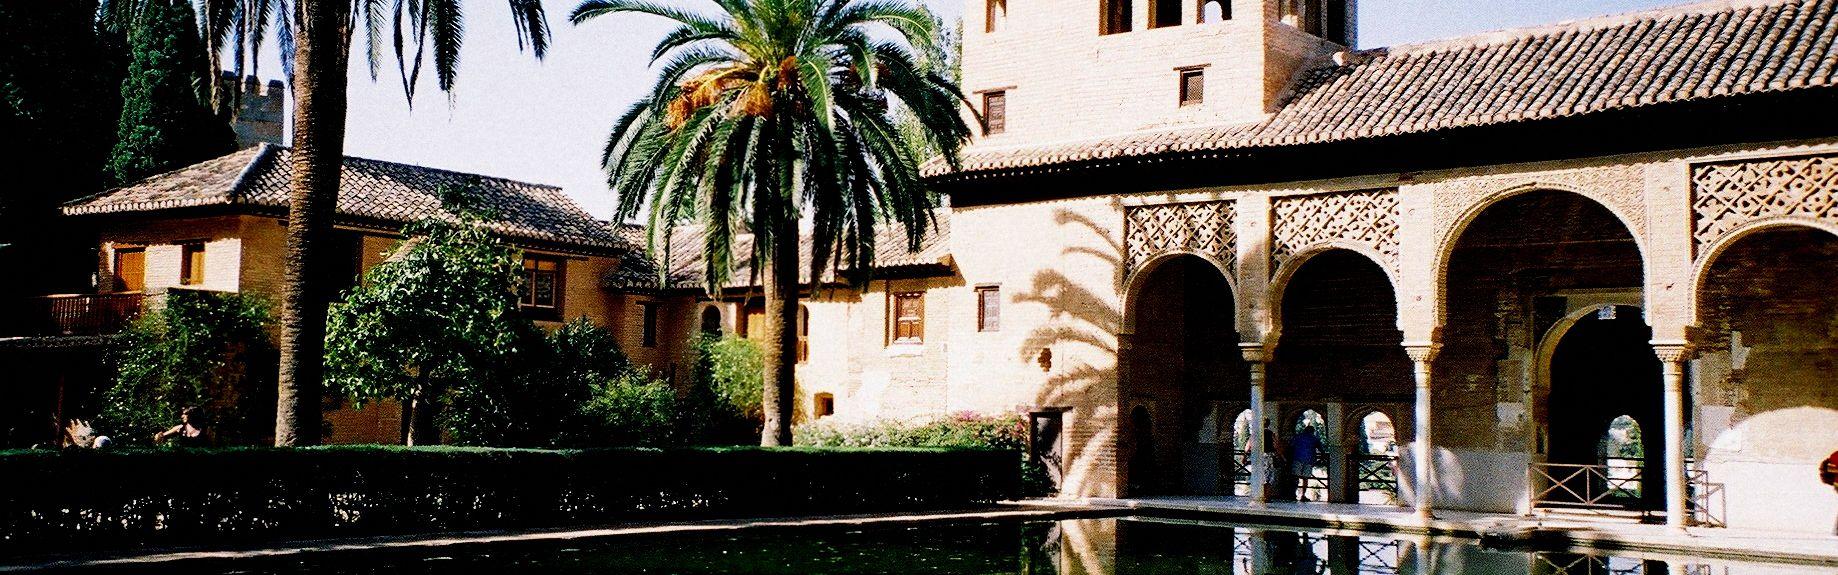 Province of Granada, Spain